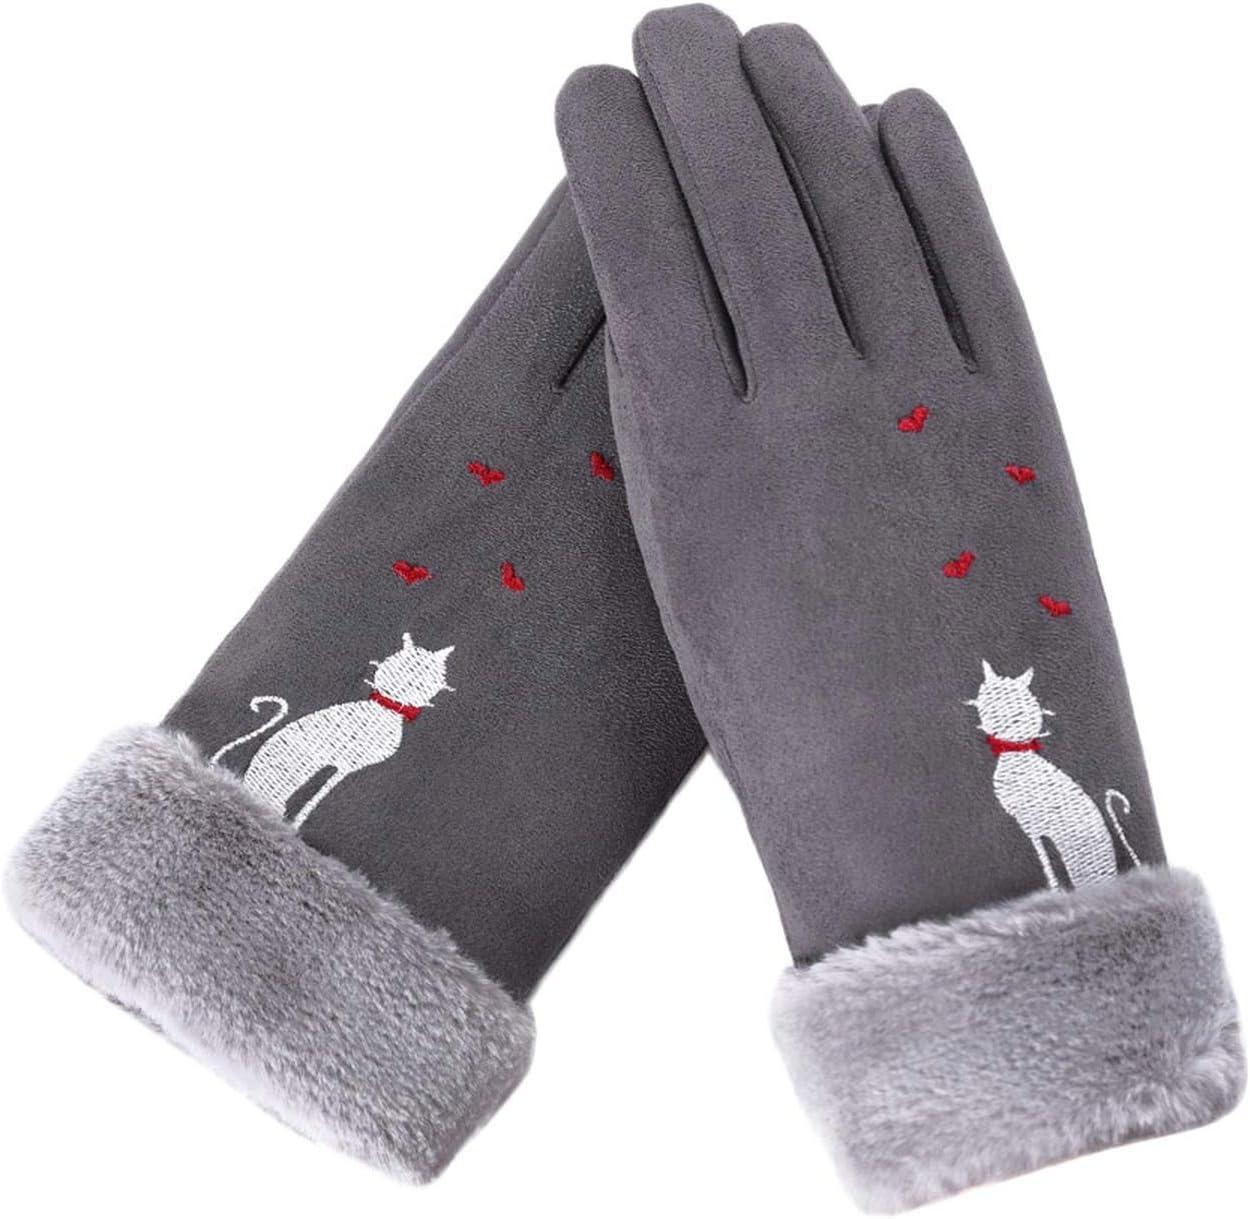 Women Gloves Winter Gloves Embroidery Mittens Full Winter WomenS Hat Finger Gloves,Black,One Size